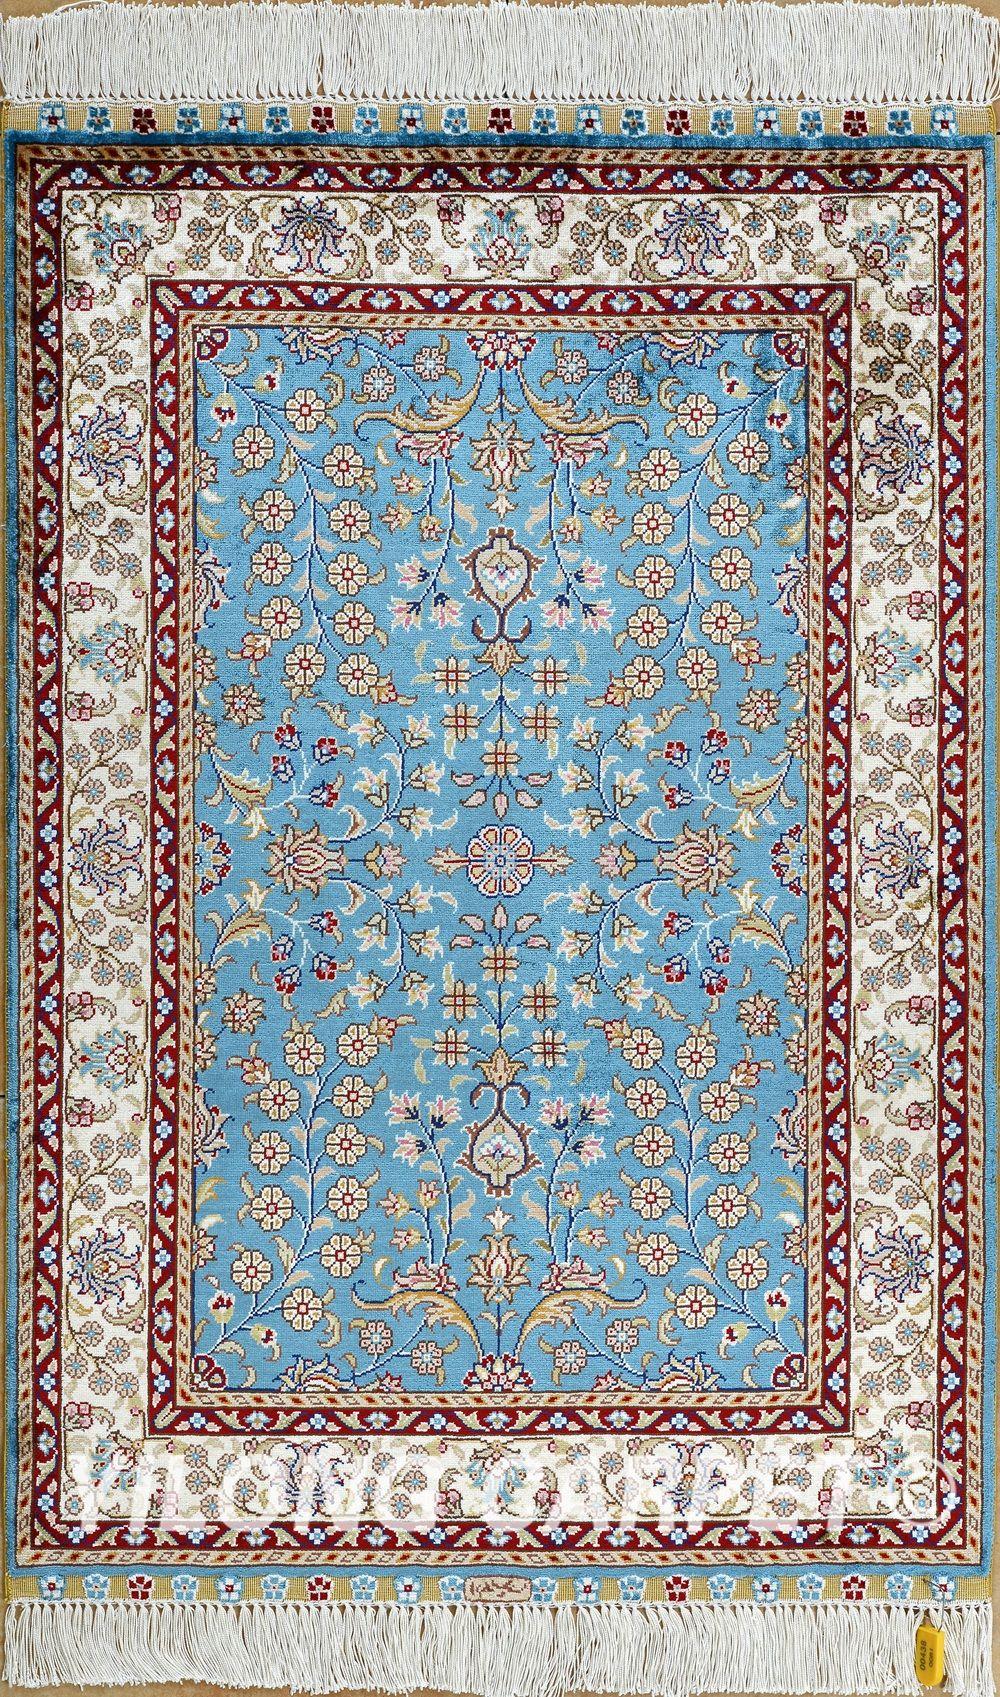 Blue Persian Rug Carpet Yellow Color Pink Beige Material Four Seasons Prayer Knots